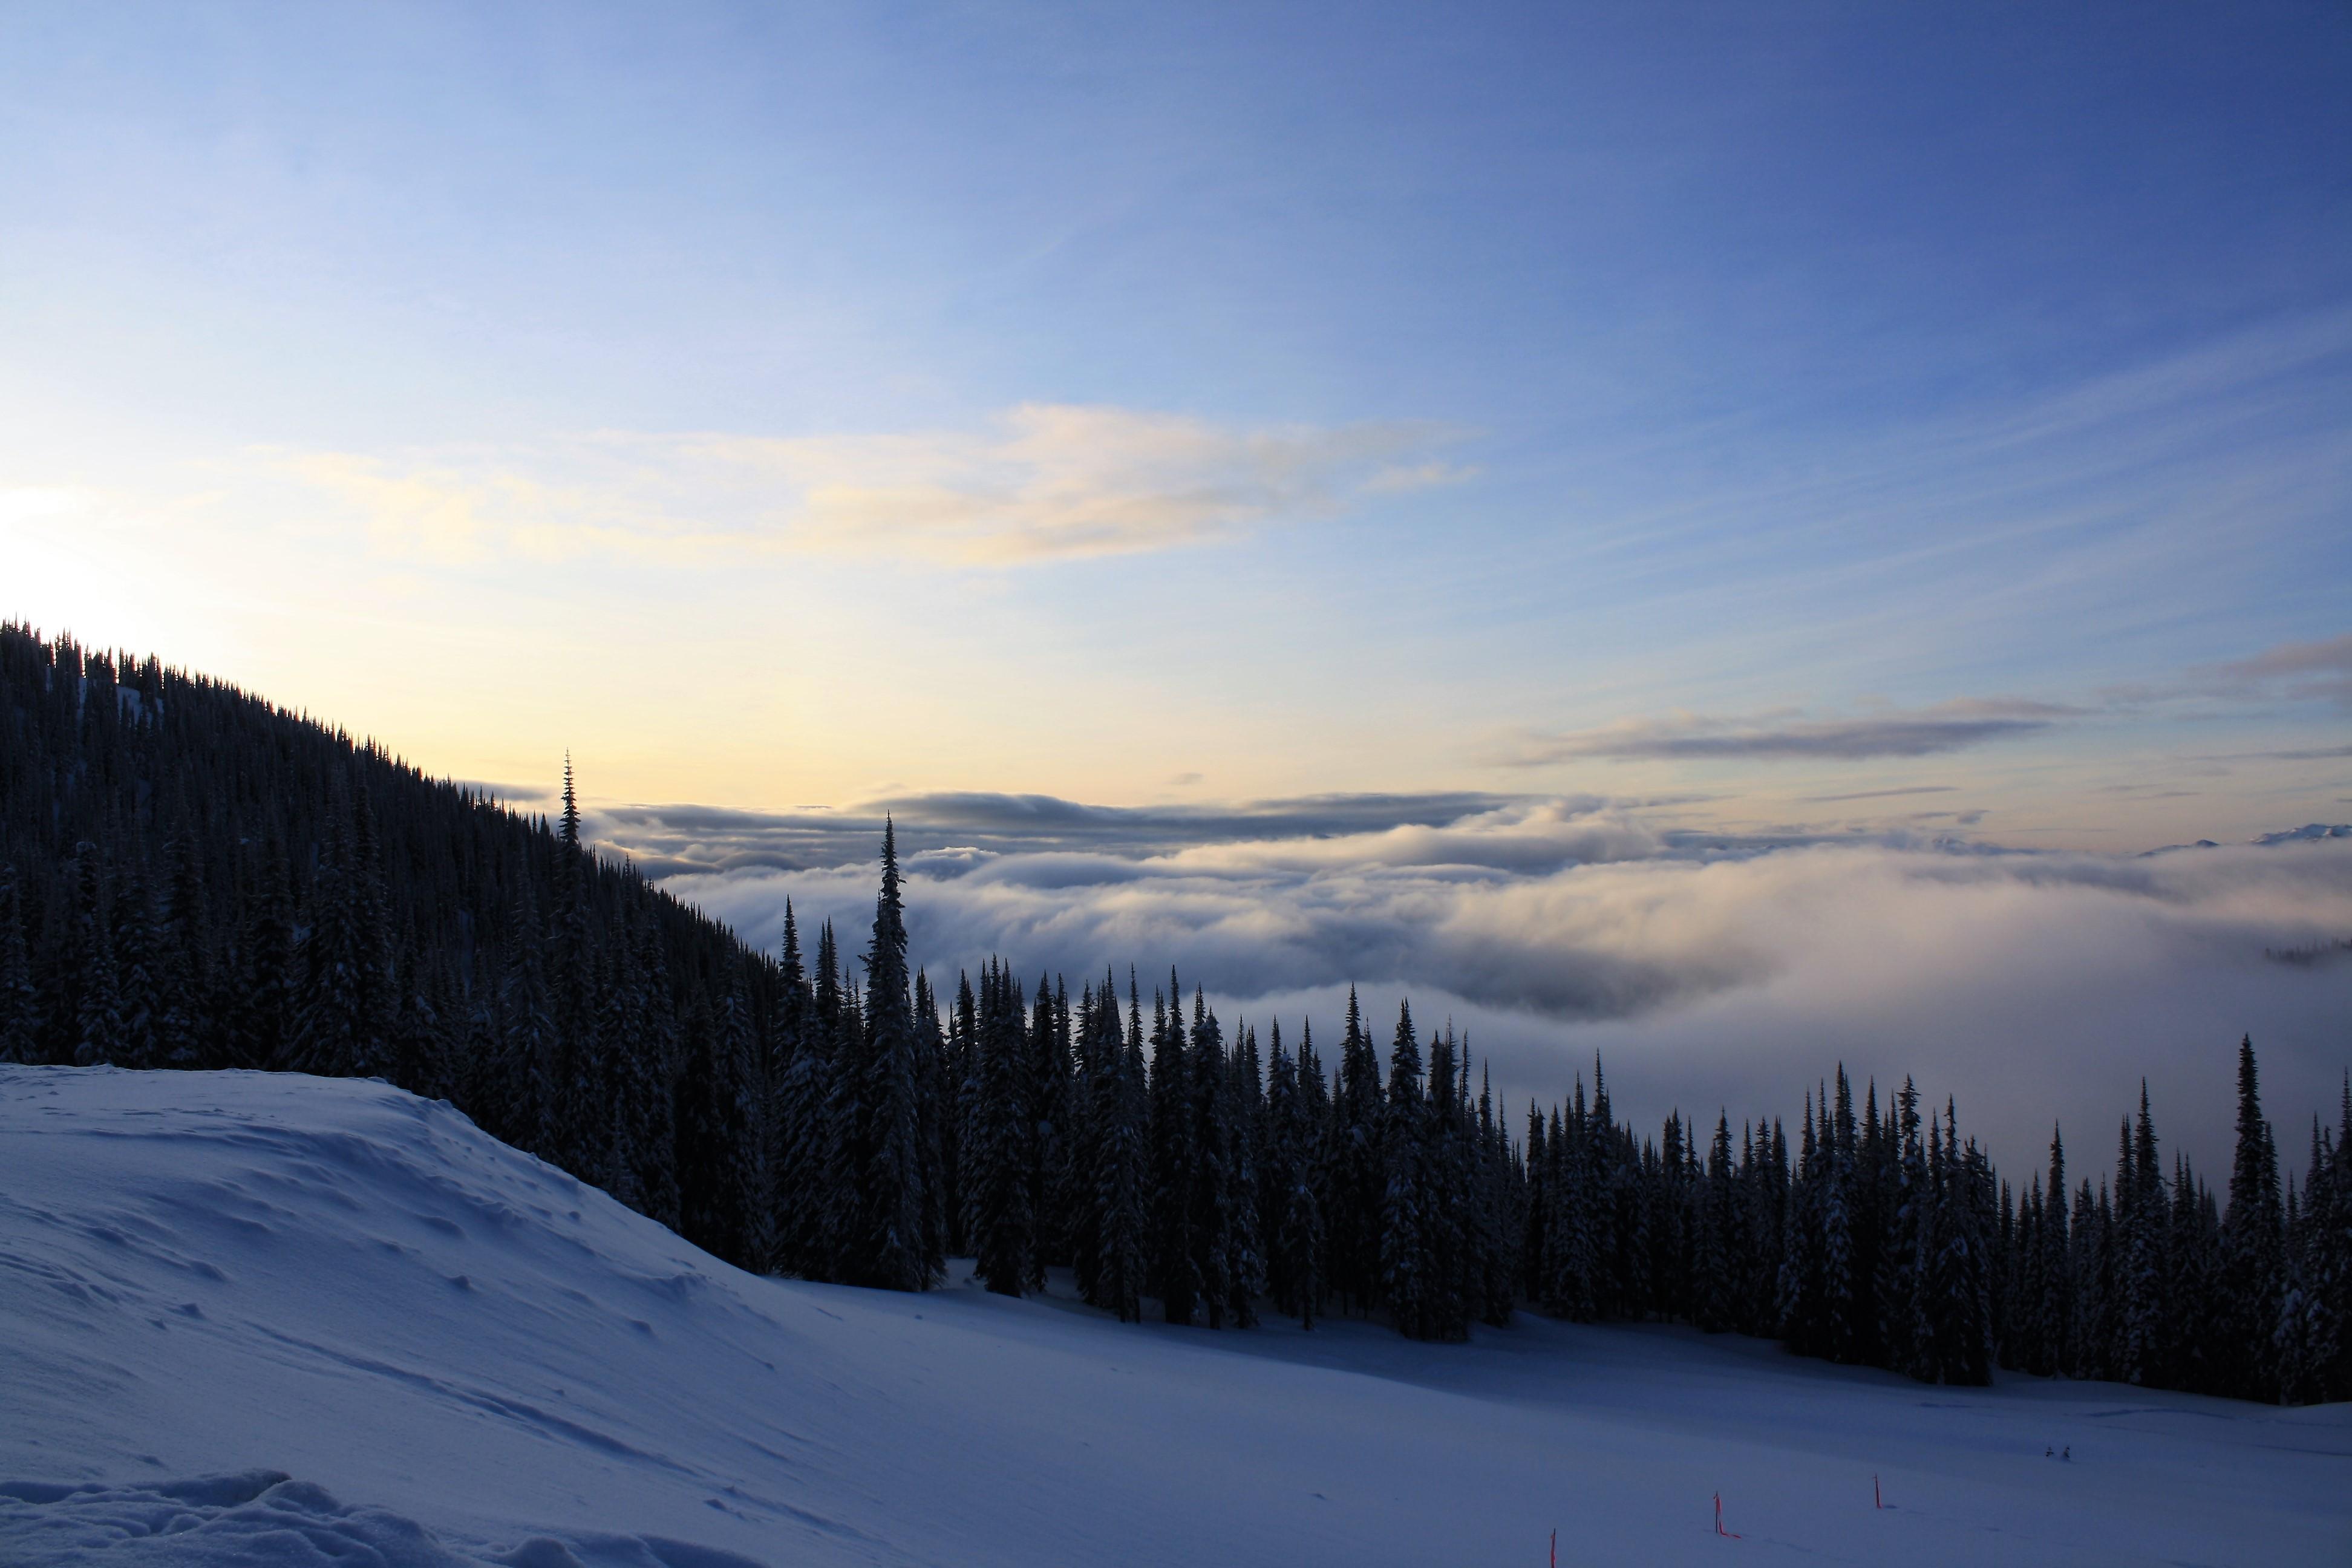 DM_nature_winter_kootenays_1764